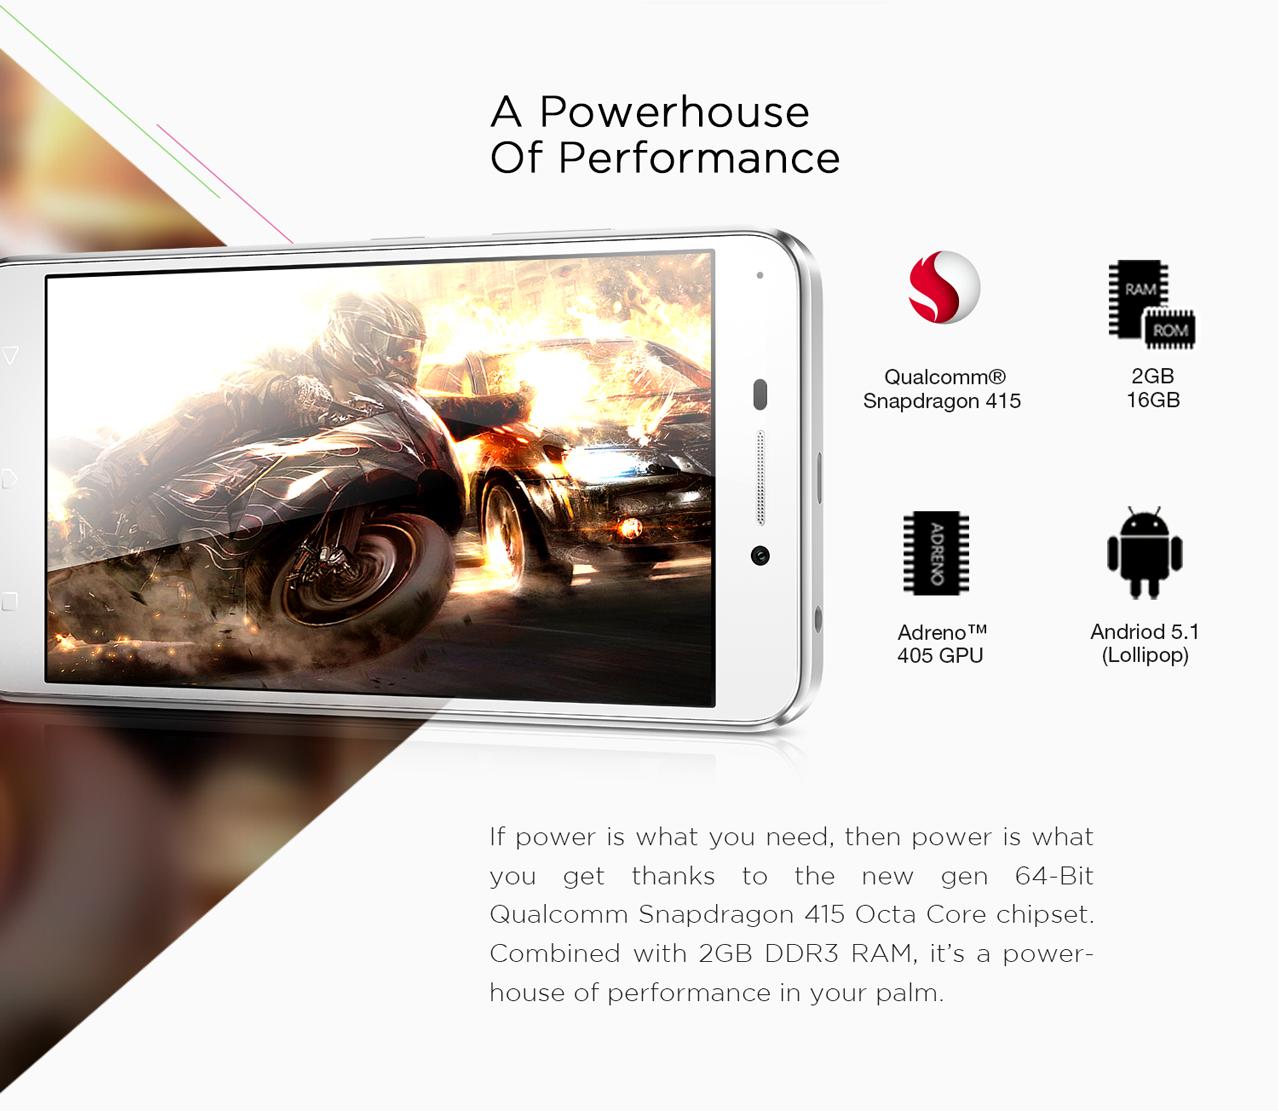 Powerhouse of Performance